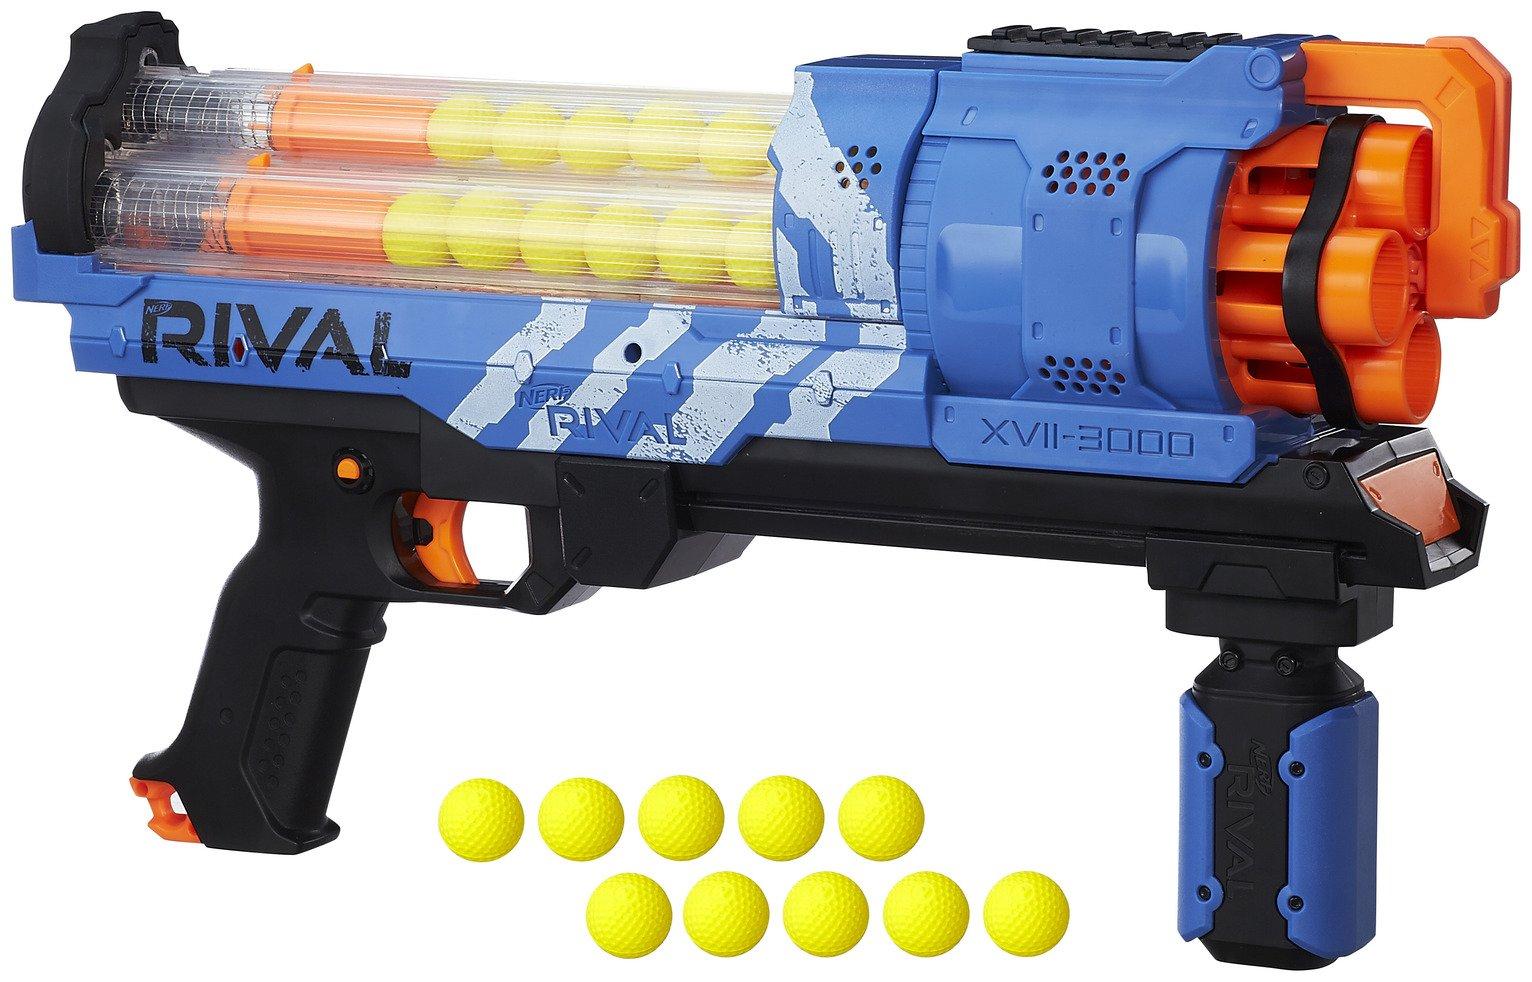 Nerf Rival Artemis XVII-3000 - Blue.